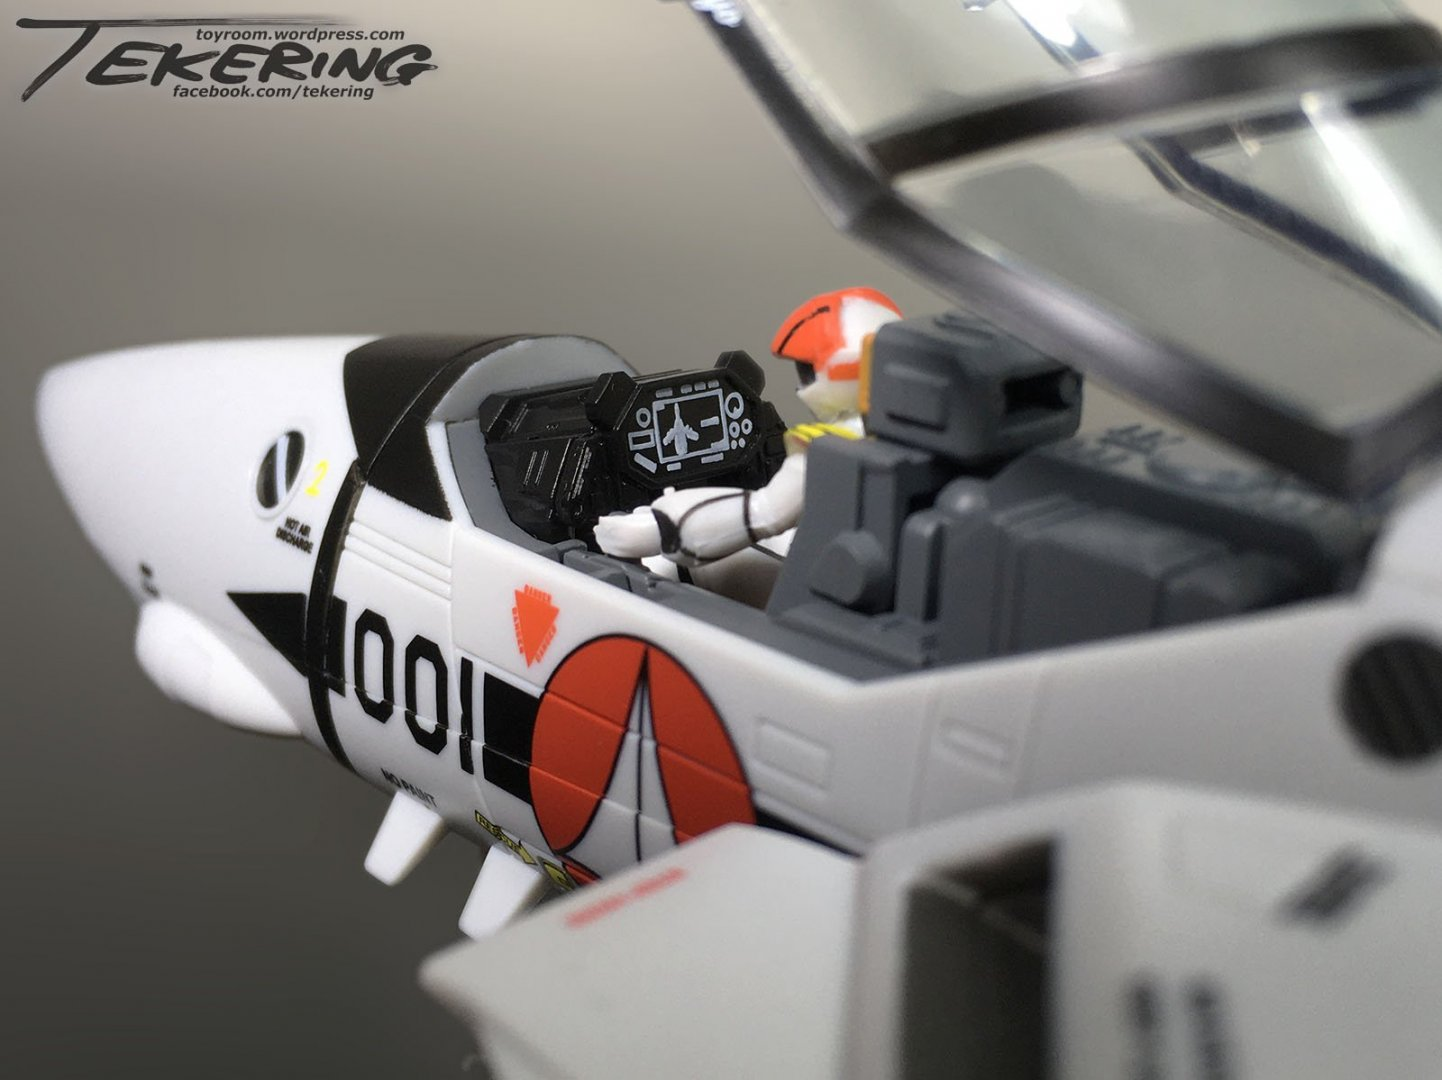 1845323002_cockpitHUD.thumb.jpg.853d3ceaf4218b1d2edd94b10ef74fcb.jpg